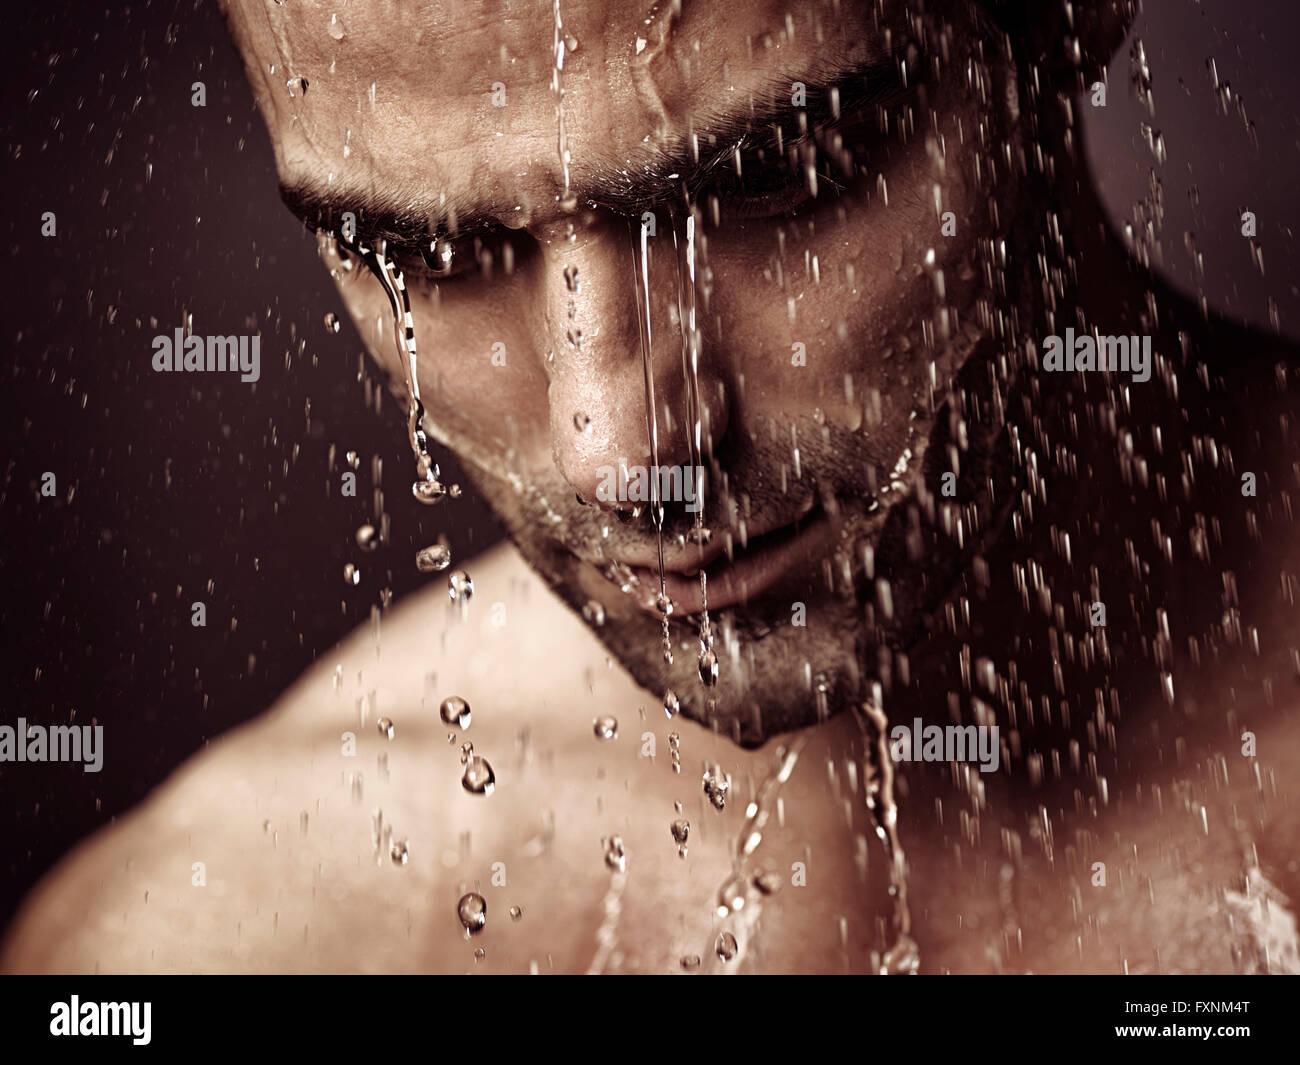 Pensativo hombre atribulado rostro bajo la ducha Imagen De Stock